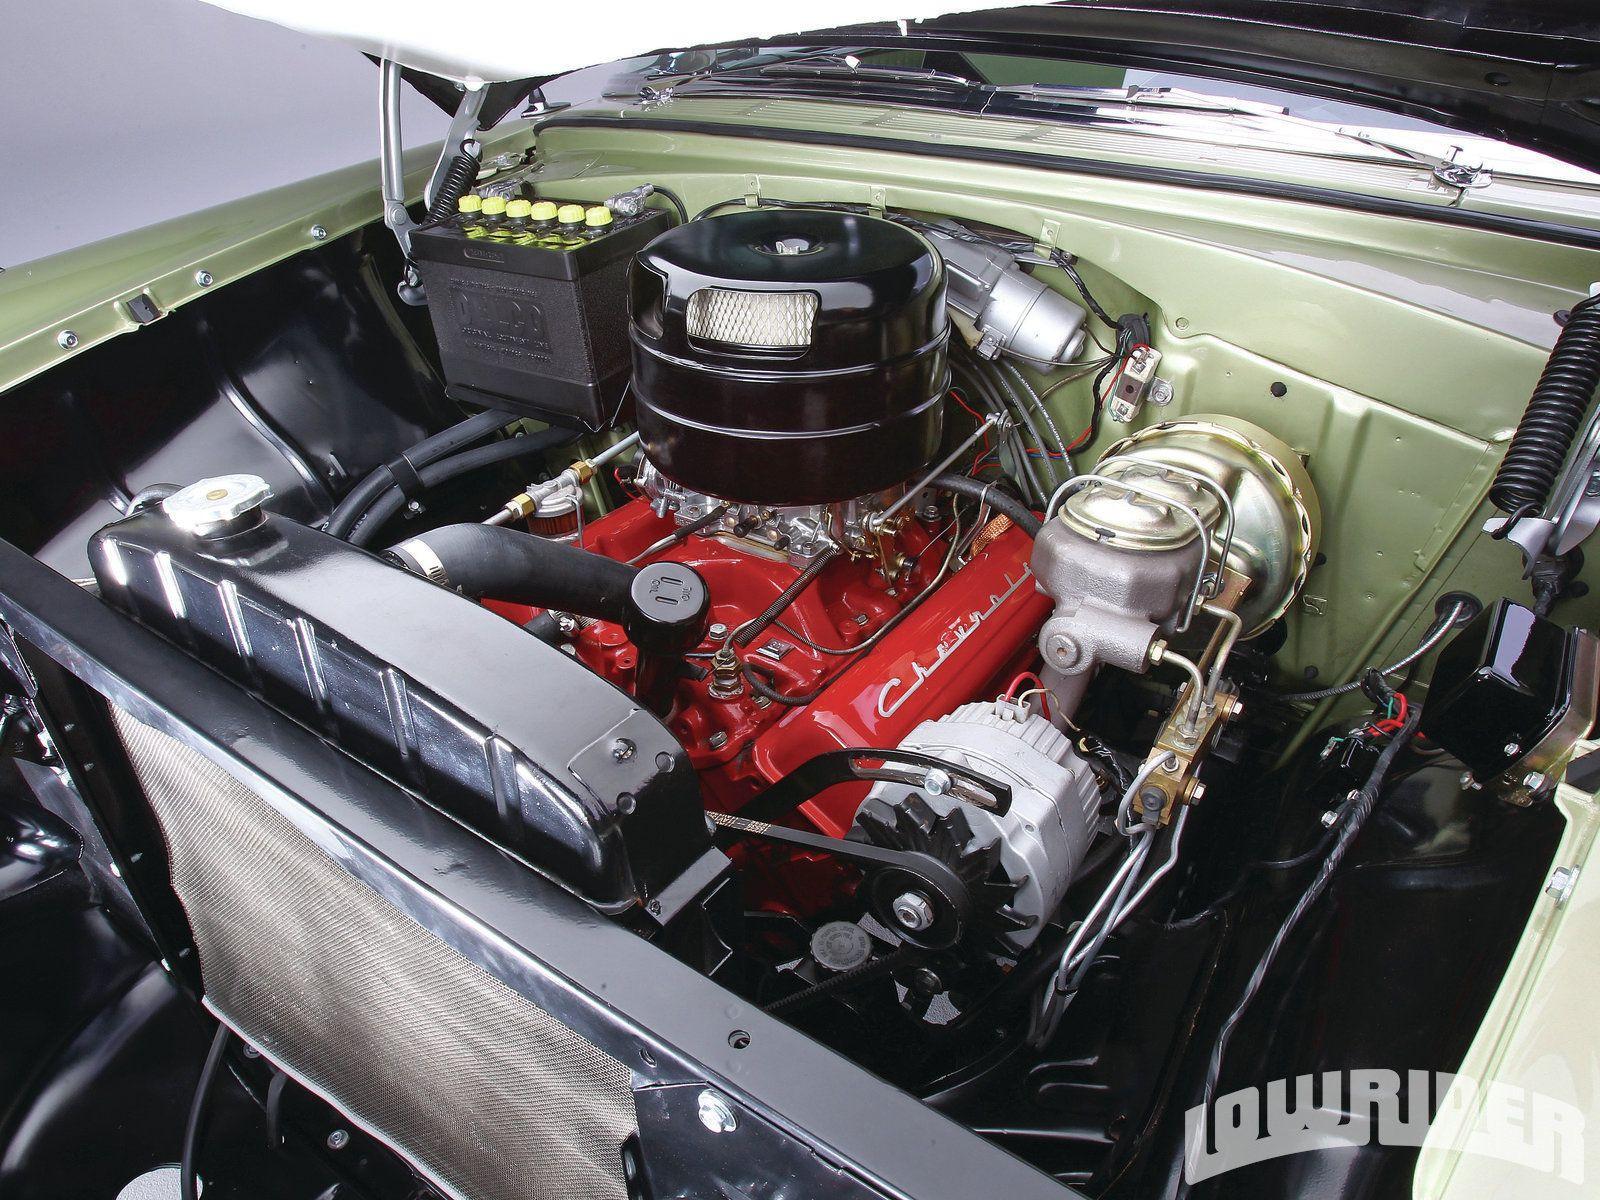 1968 Corvette Radio Wiring Diagram 1956 Chevrolet Bel Air Engine Bay Chevrolet Bel Air Bel